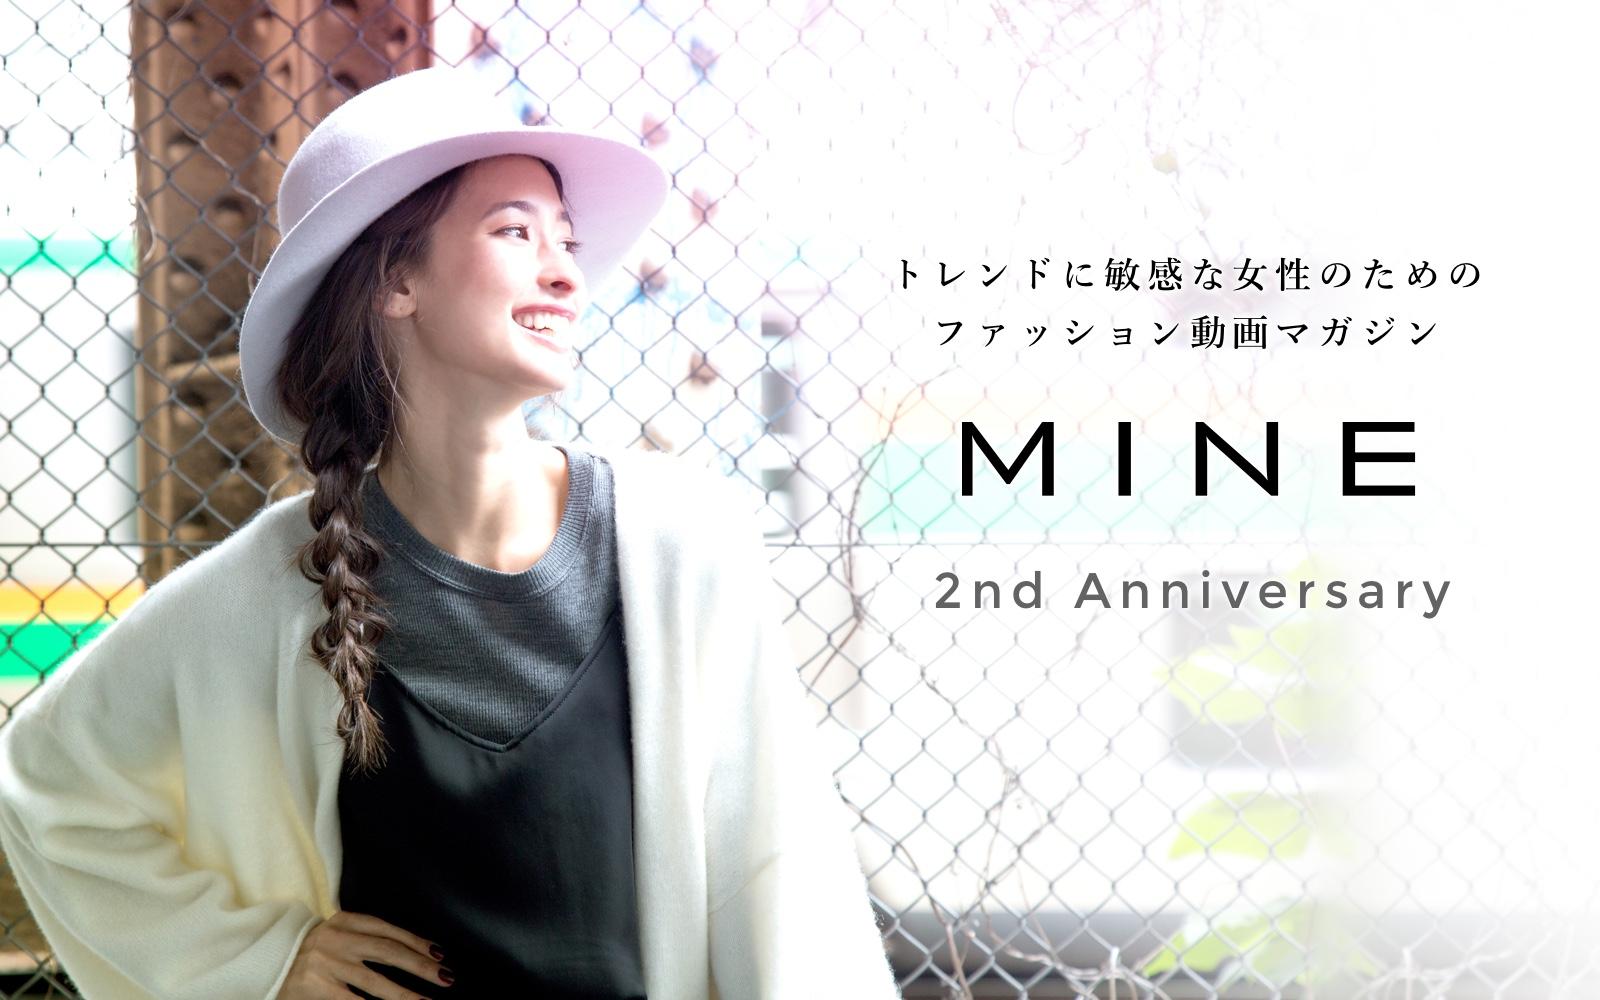 「MINE BY 3M」がリリース2周年! 動画制作本数累計2500本を突破し、 日本最大級のファッション動画メディアへ成長。 -SNSでは2周年記念ムービーを限定配信!-